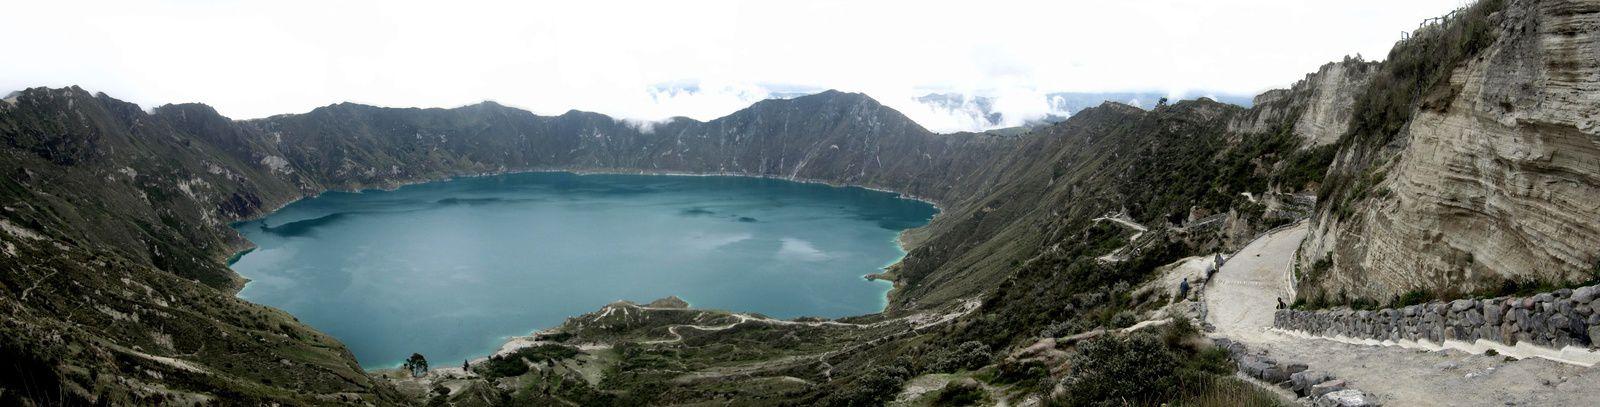 Quilotoa: La laguna!!